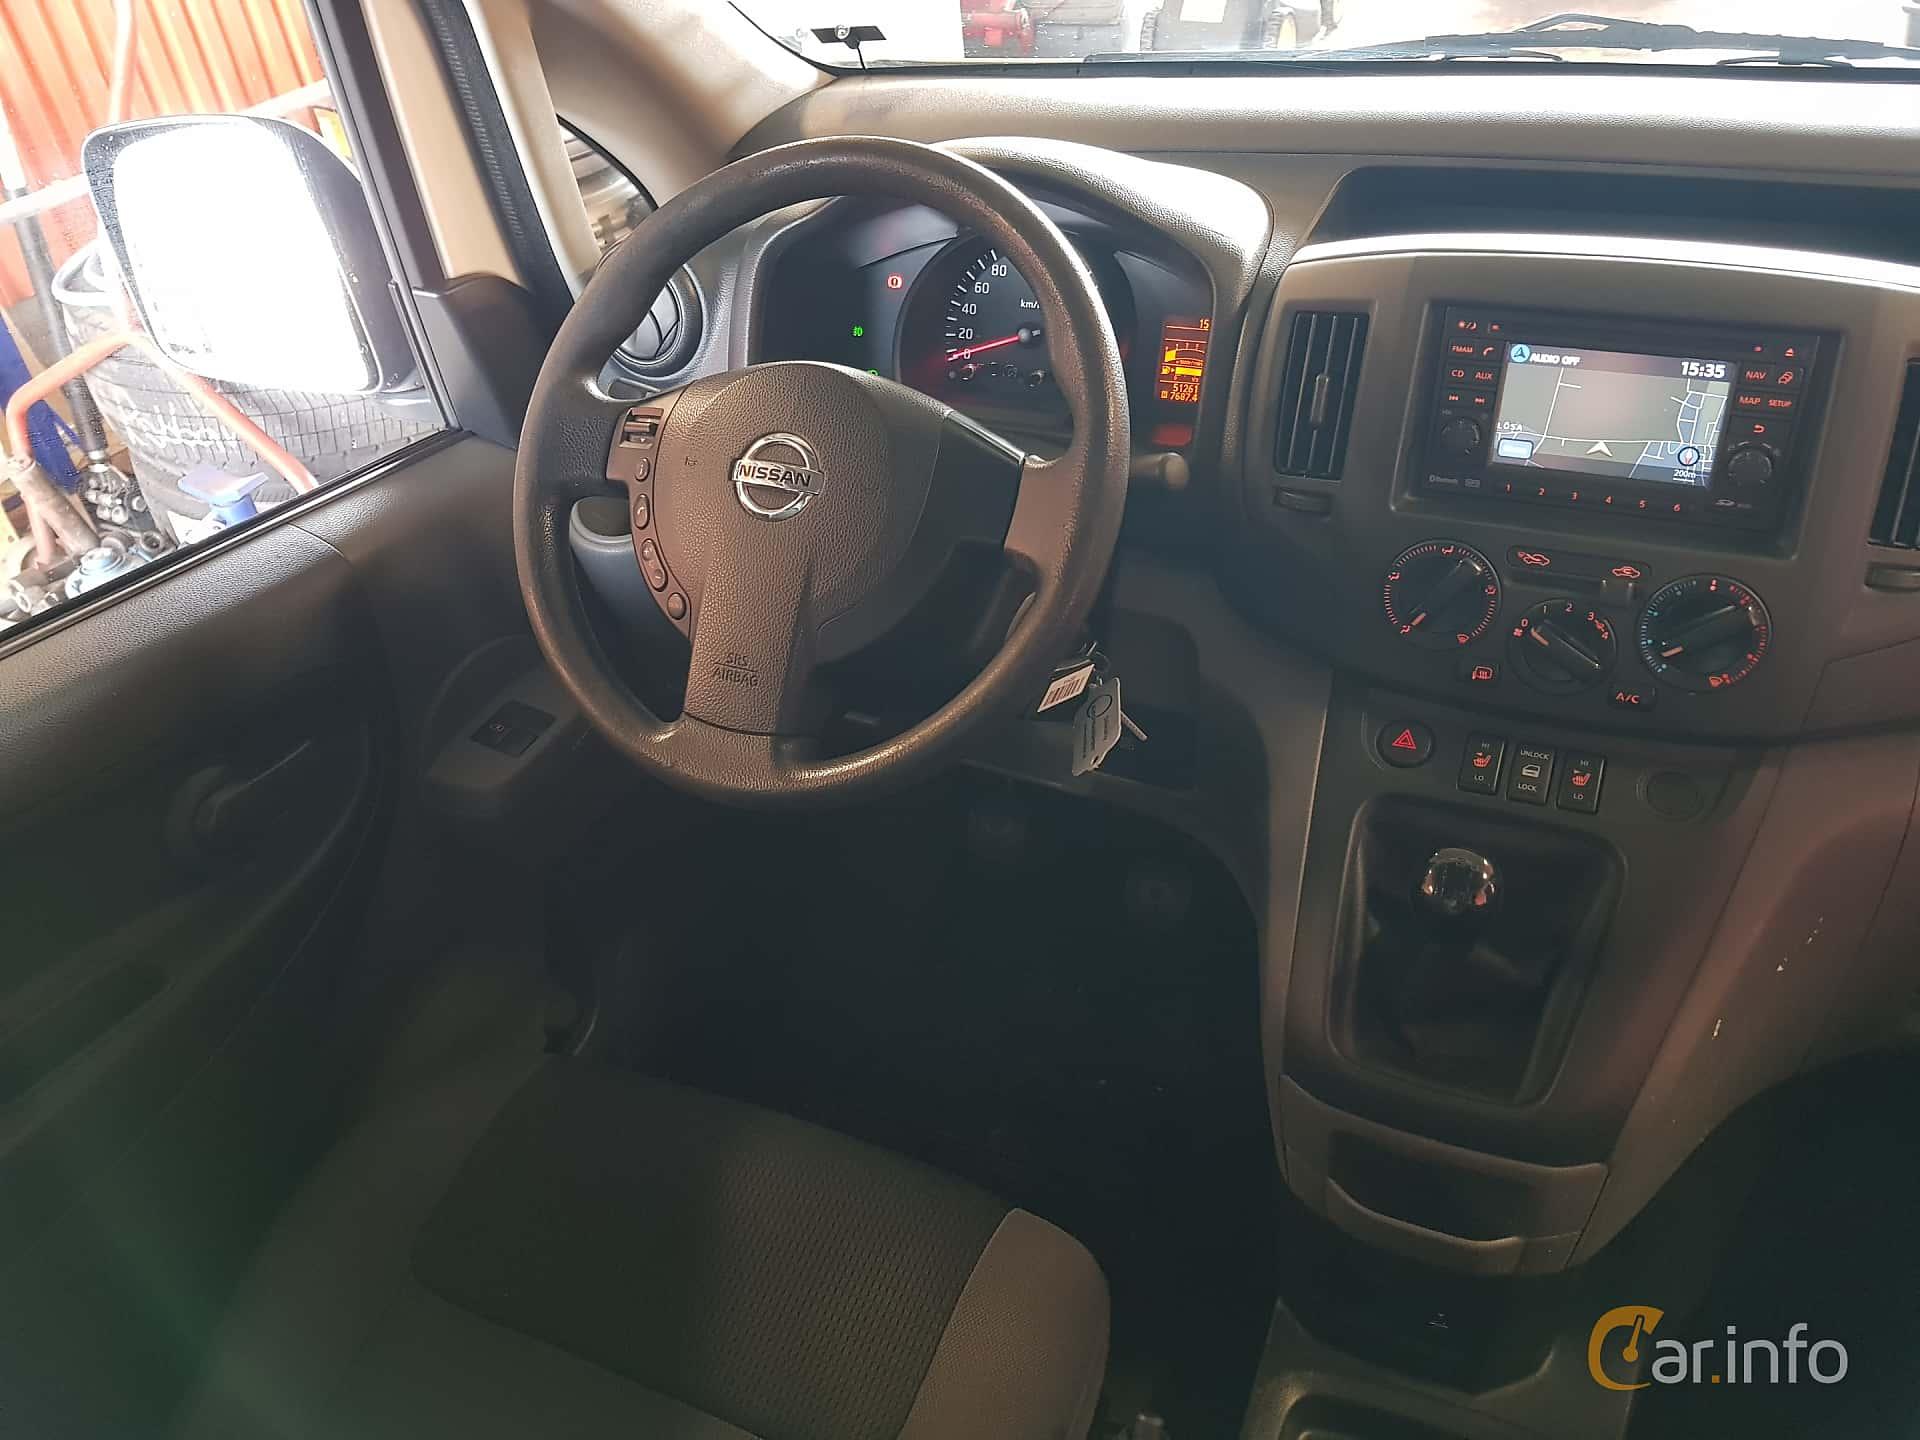 Nissan NV200 Van 1.5 dCi Manual, 90hp, 2015